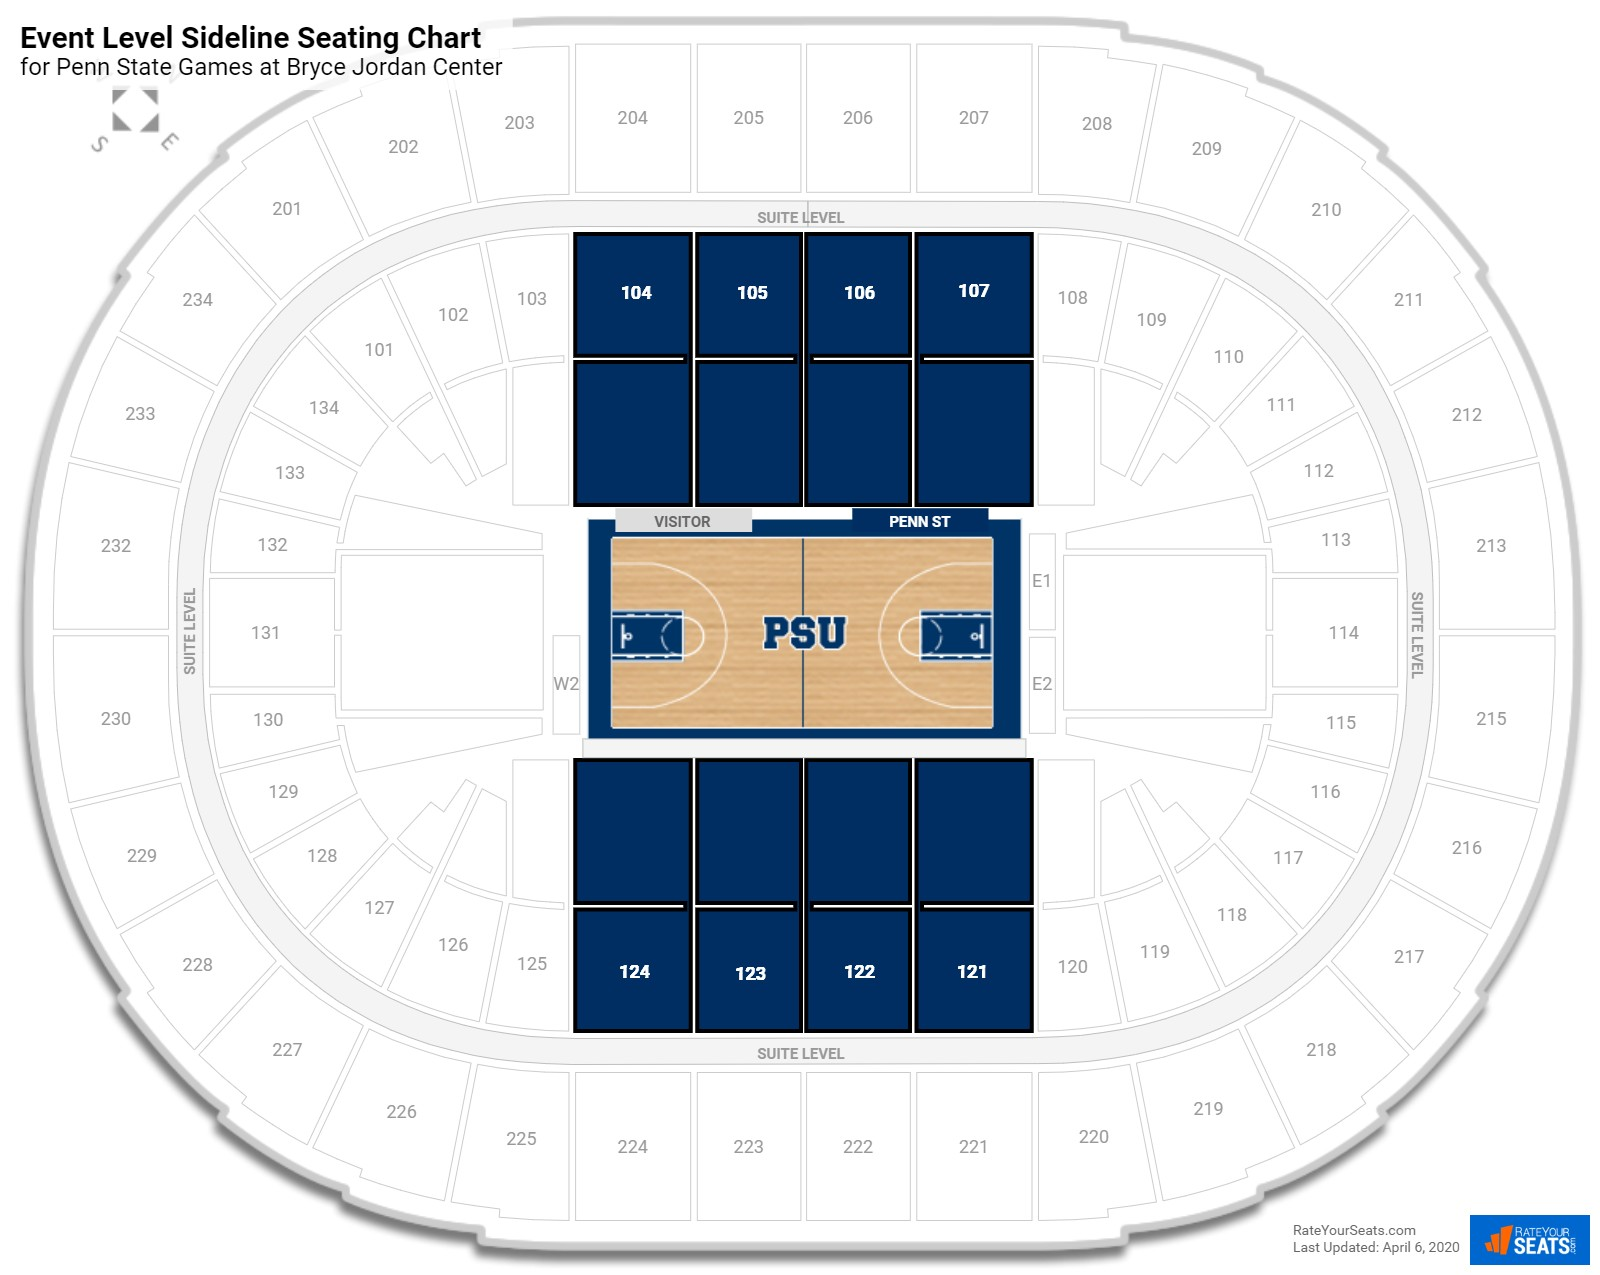 Bryce Jordan Center Event Level Sideline Seating Chart